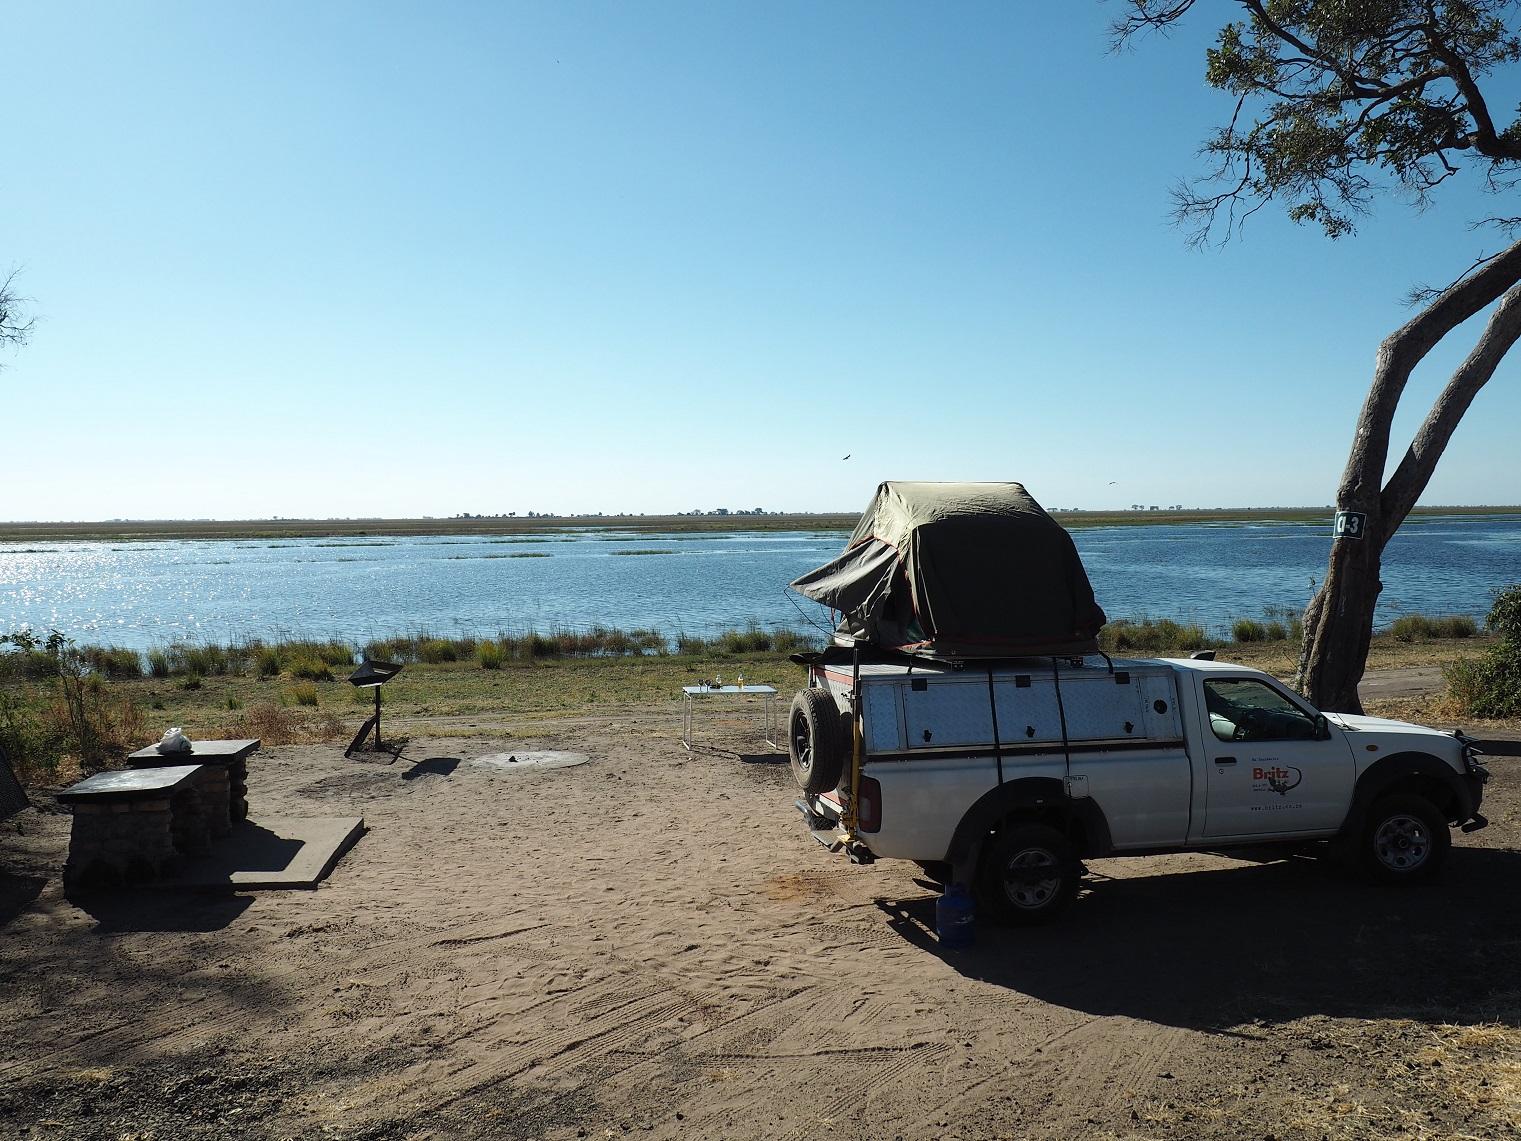 Campingplatz Moremi Dachzelt Rundreise Chobe Botswana